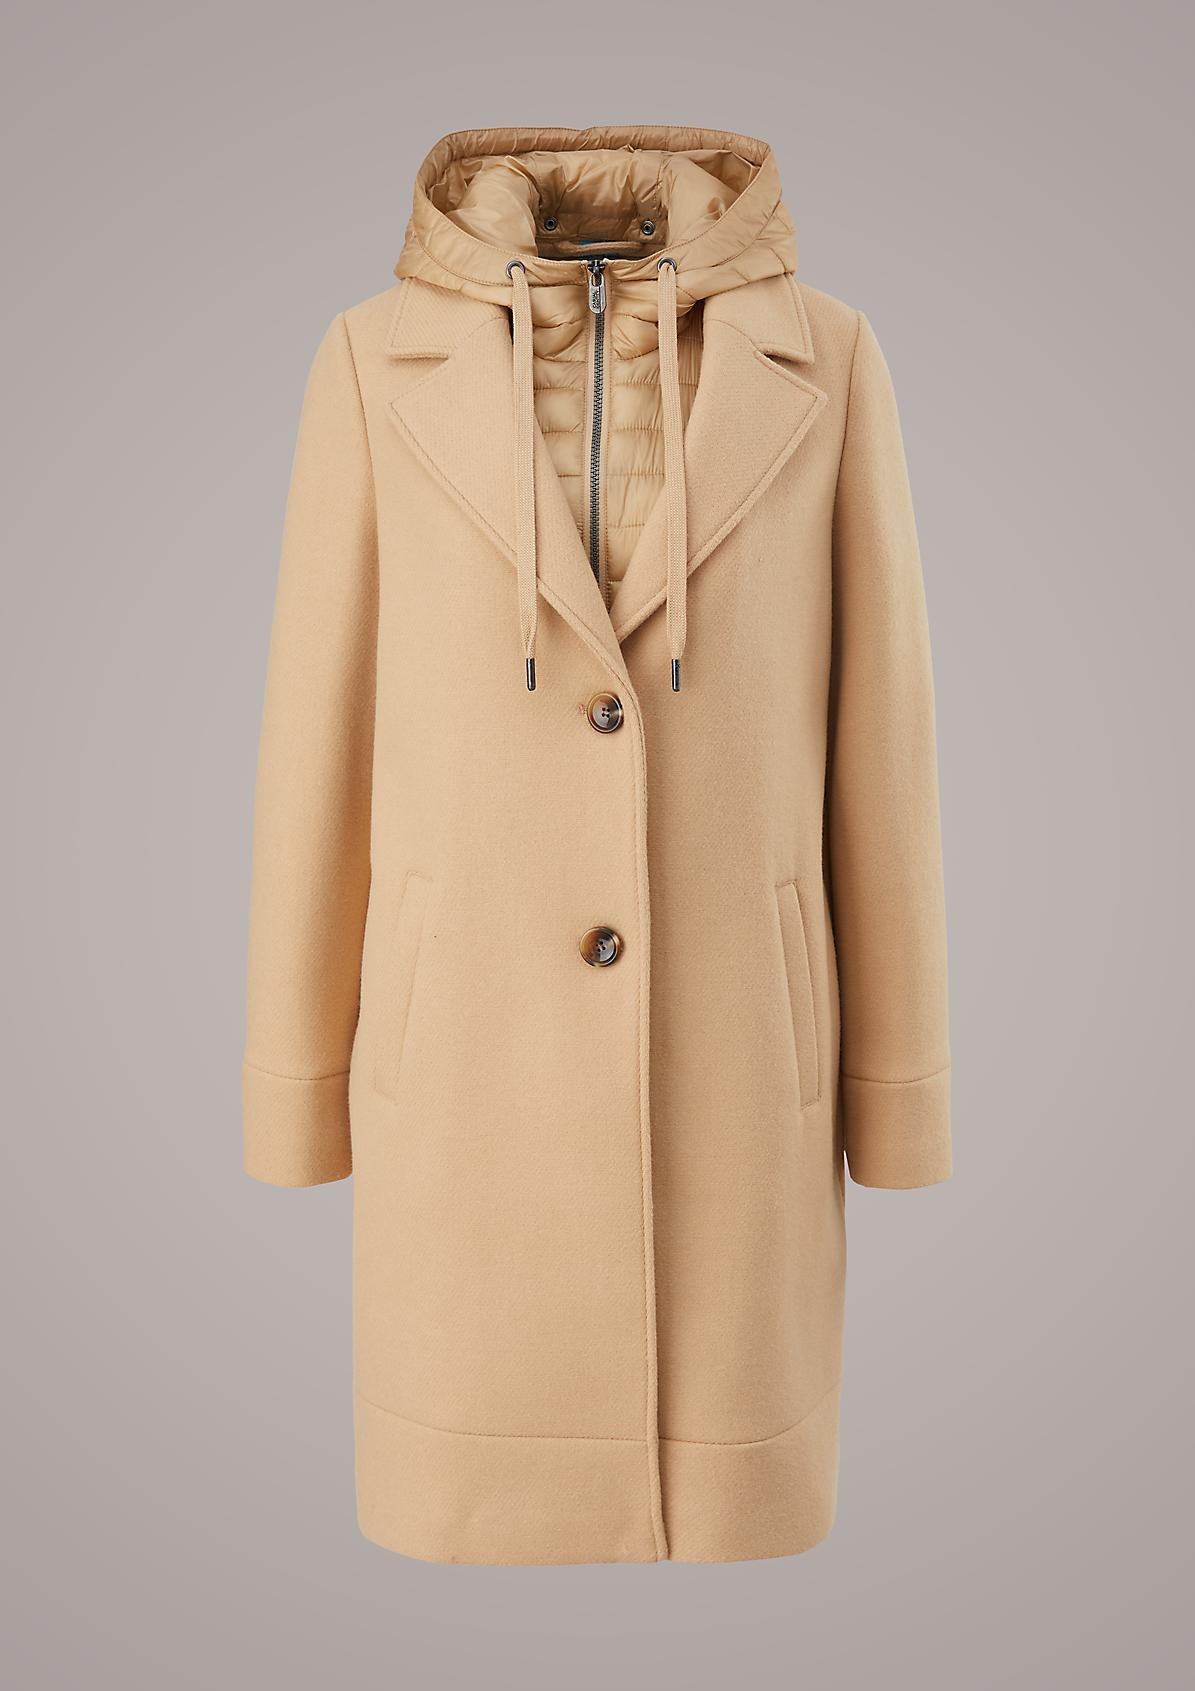 Mantel mit Kapuzeneinsatz